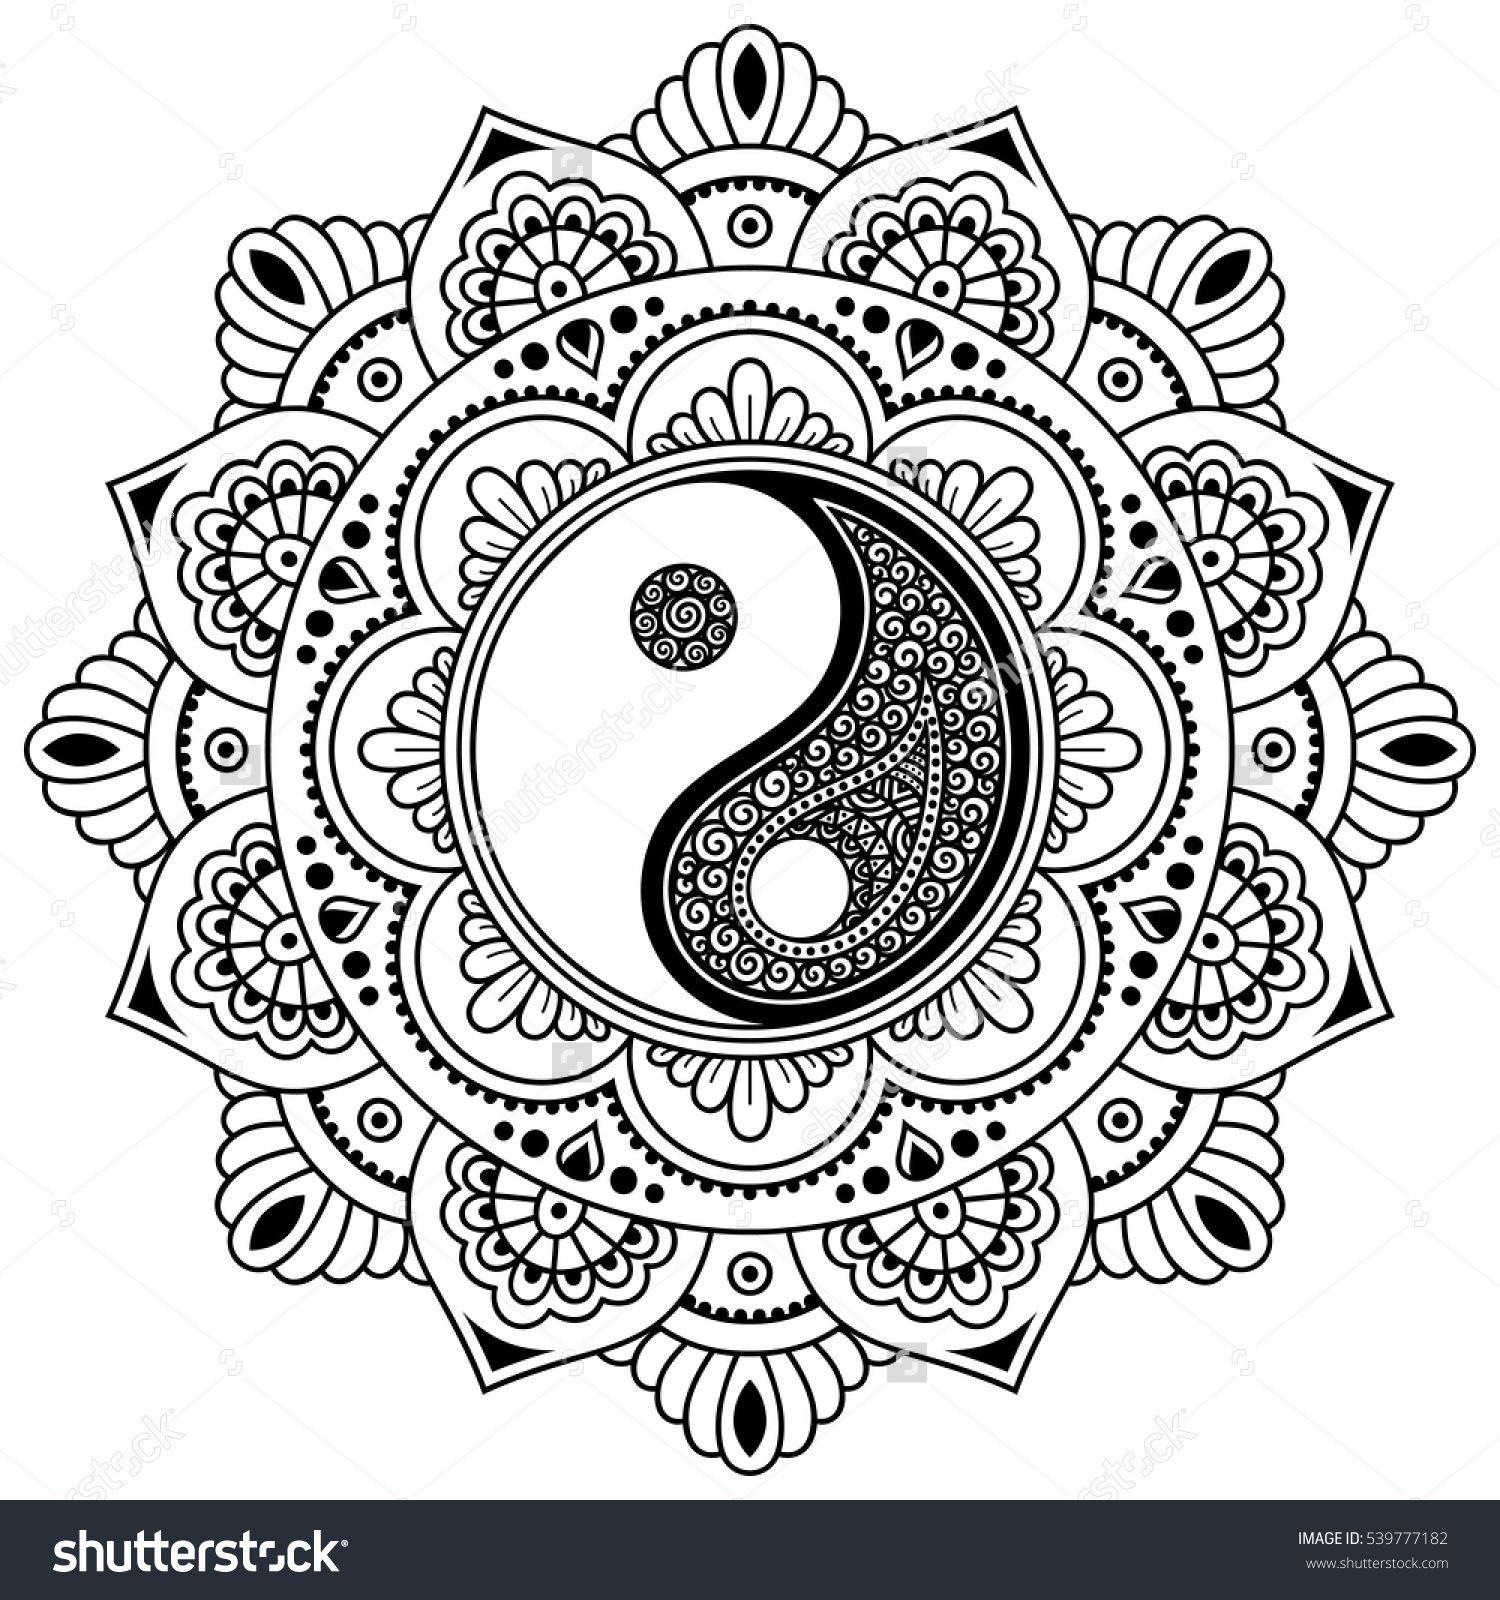 ying yang yo coloring pages - photo#19